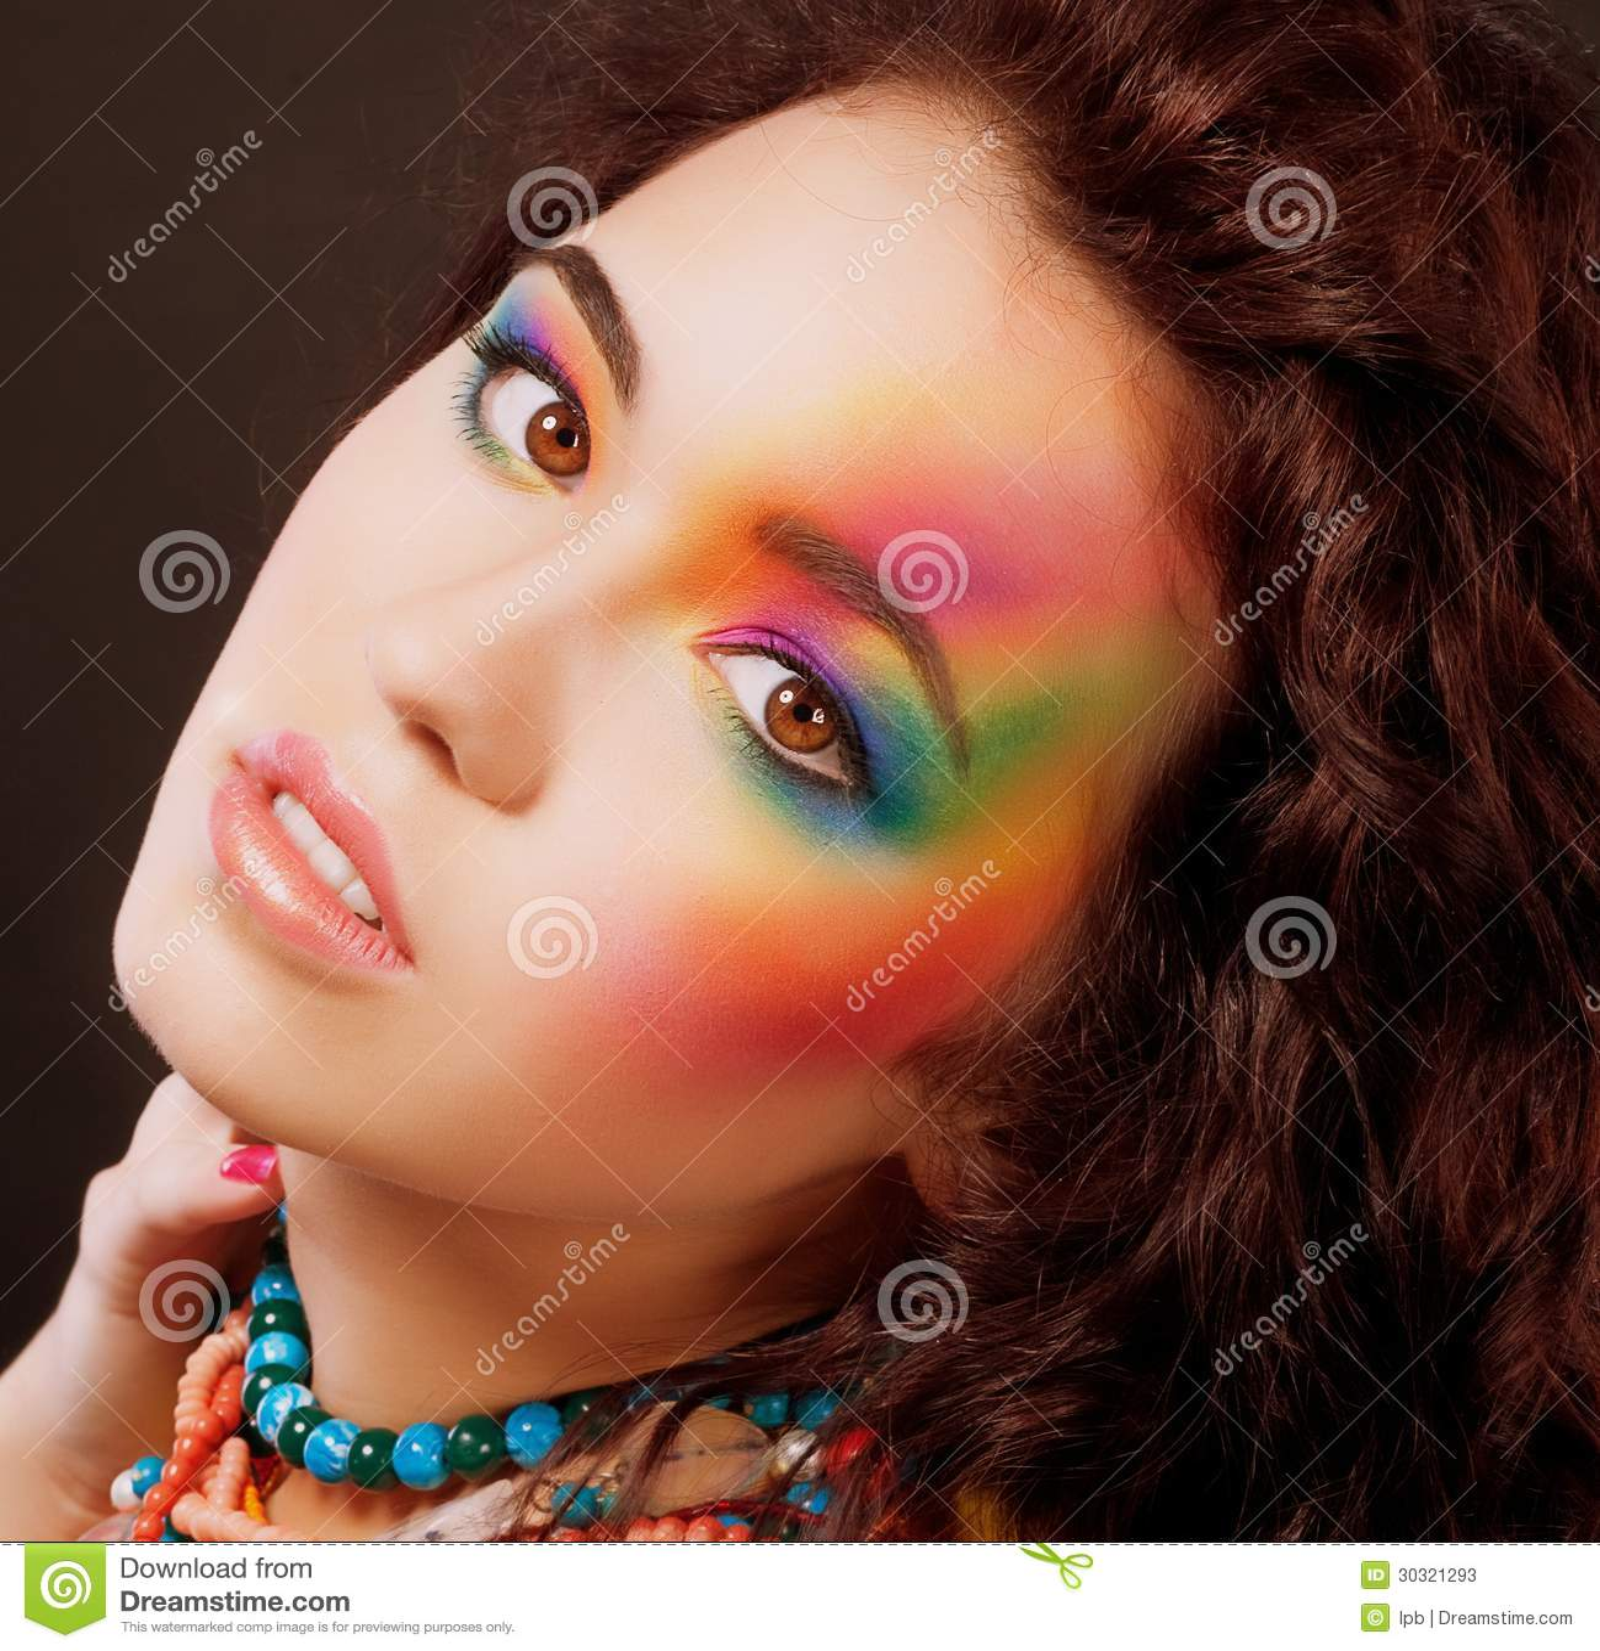 imagination le visage de la femme multicolore maquillage color vibrant darc - Colori Maquillage